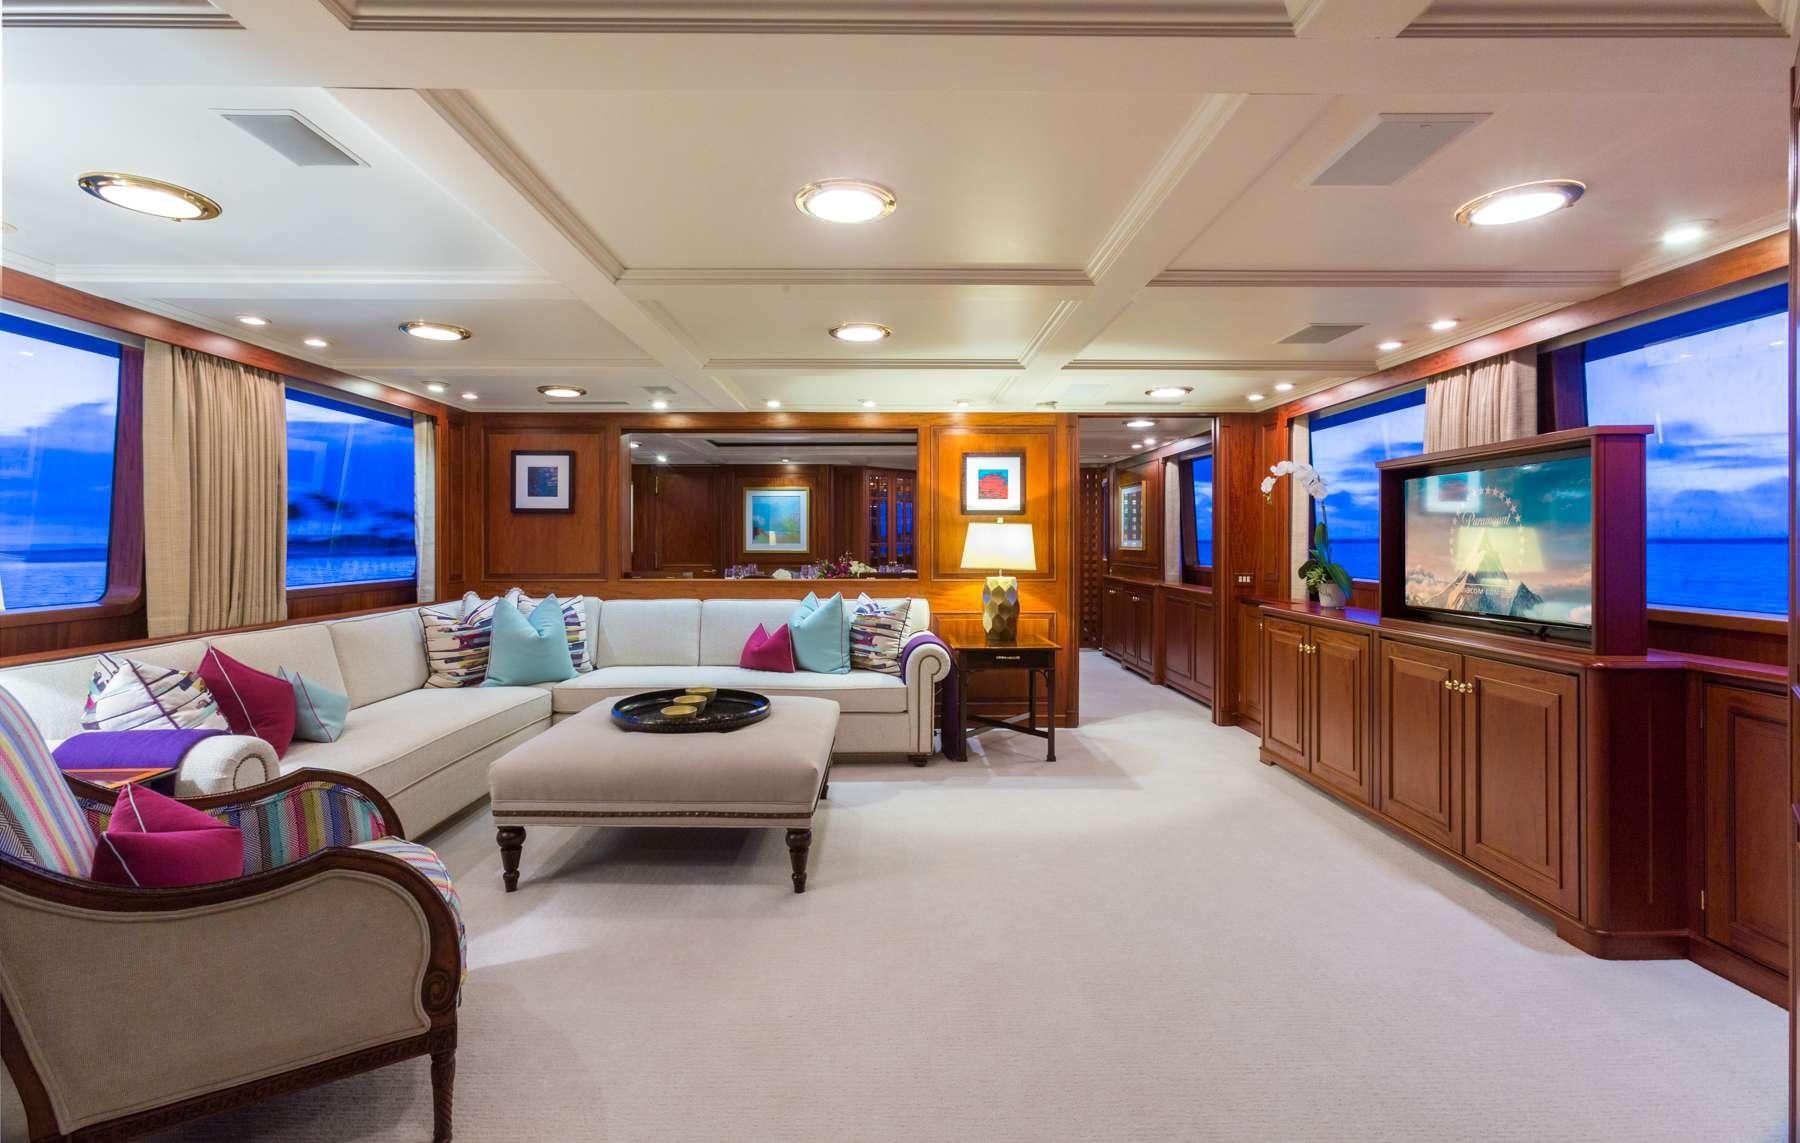 Motor Yacht 'LADY J' Main Salon, 12 PAX, 9 Crew, 142.00 Ft, 43.00 Meters, Built 1997, Palmer Johnson, Refit Year 2017